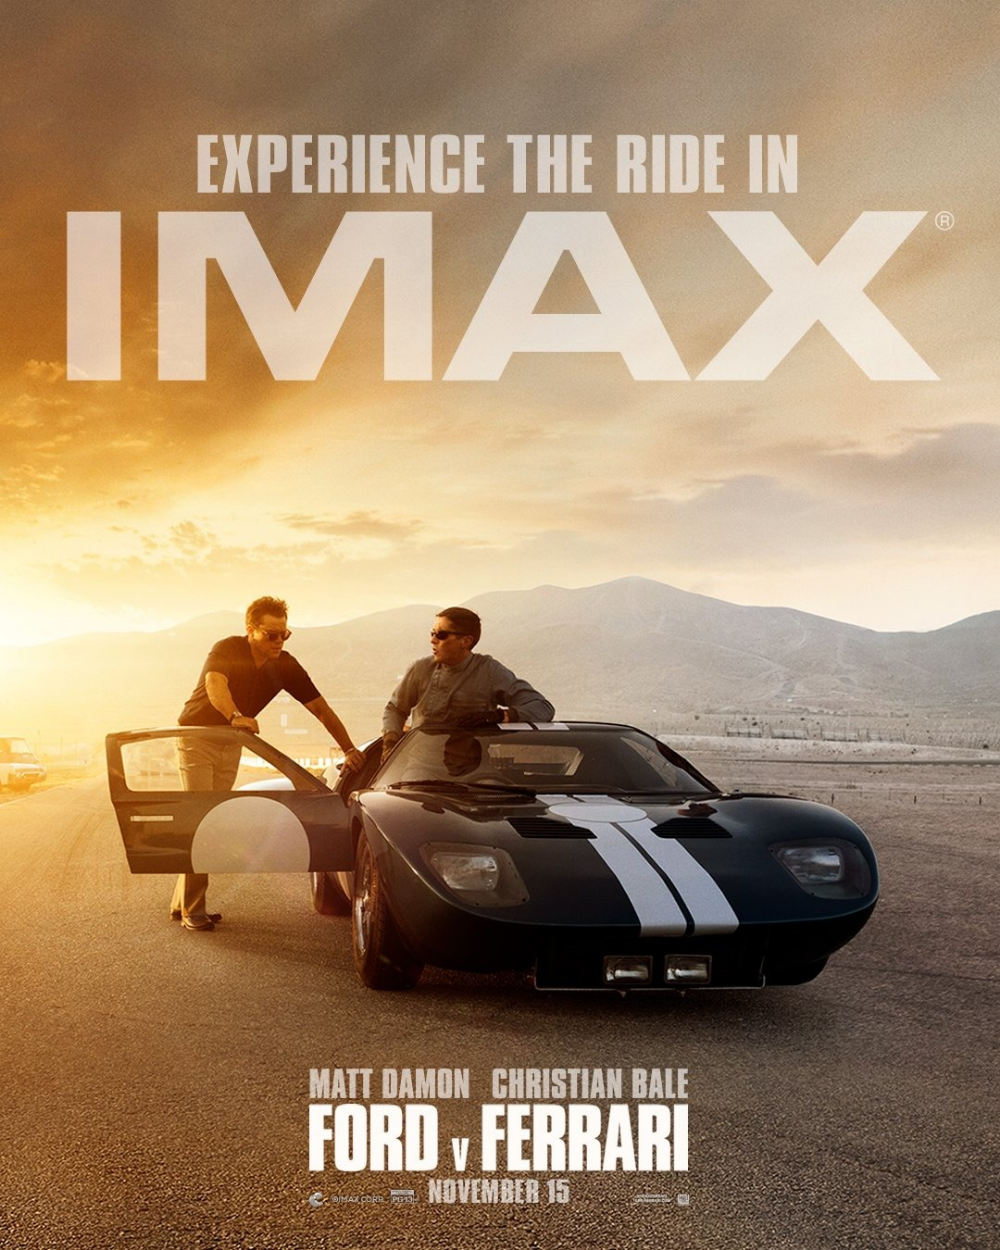 Poster Filma Ford Protiv Ferrari Poster Filma Ford Filmy